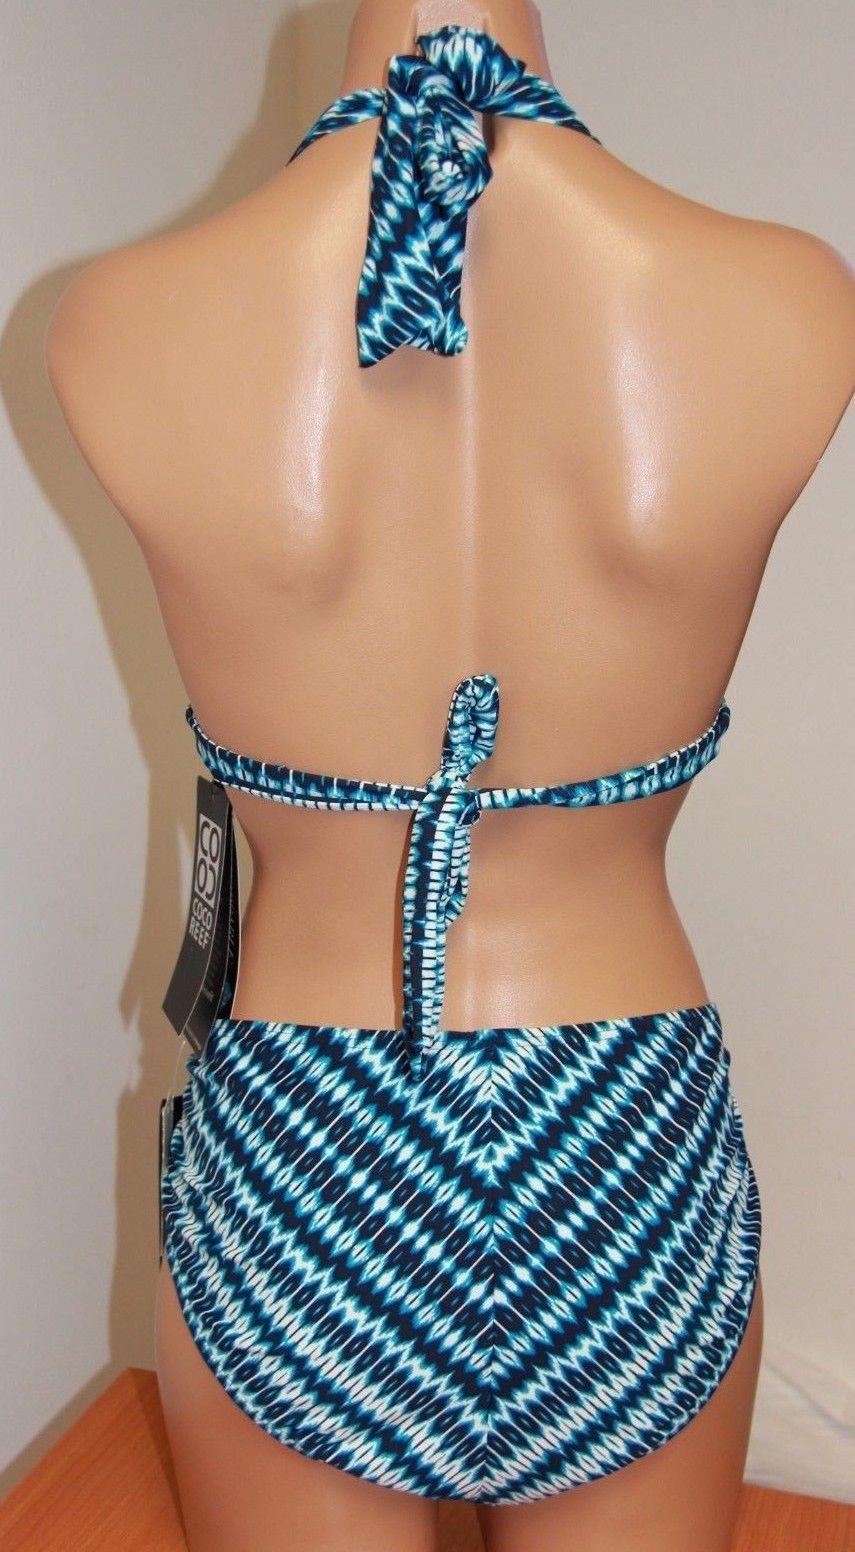 New Coco Reef Swimsuit Bikini 2pc Set Size 36/38C/XL Navy Capta